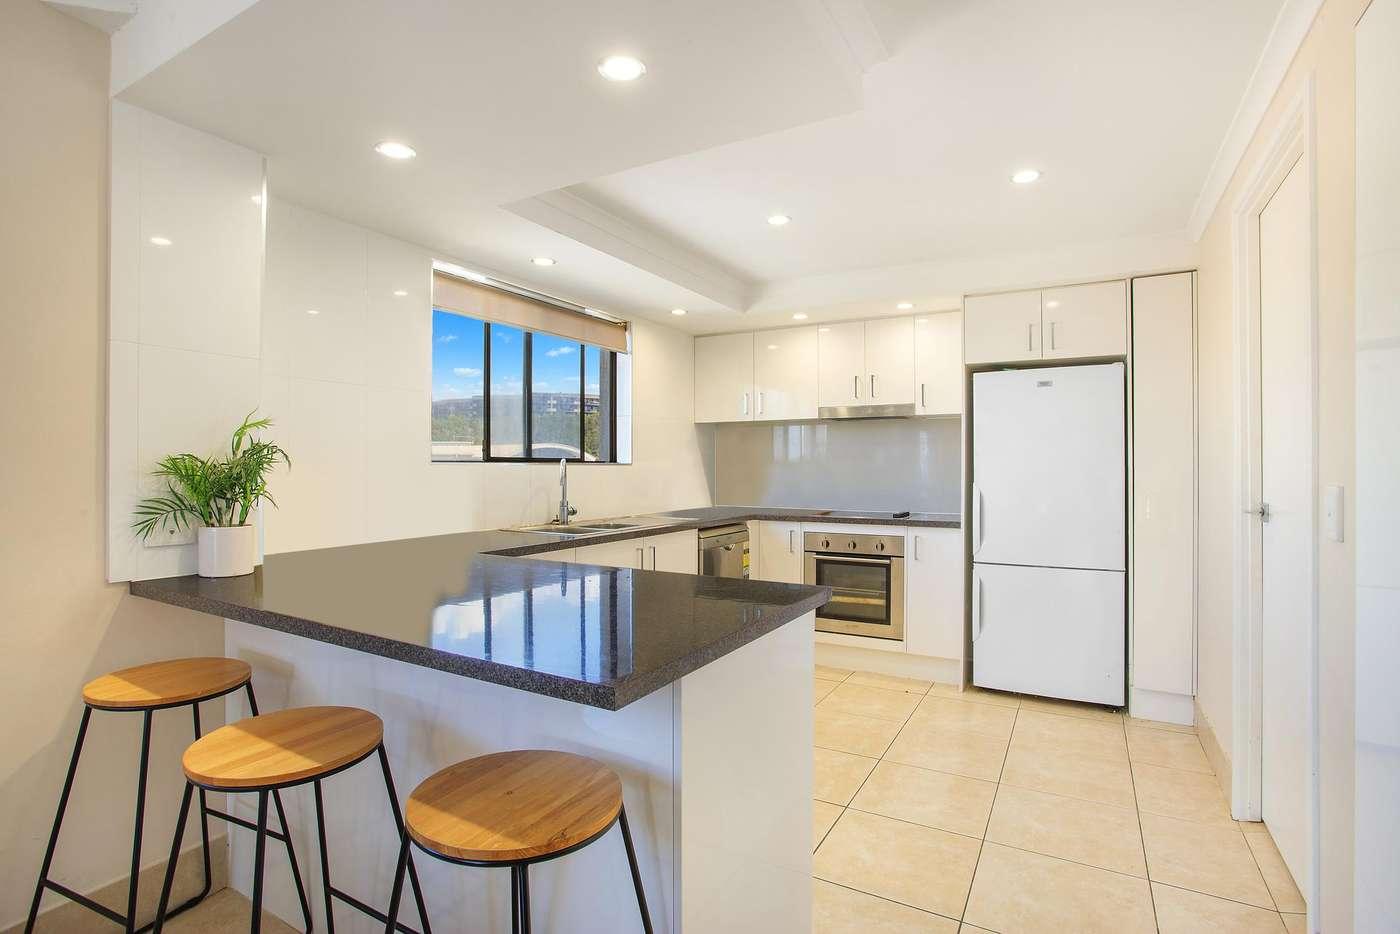 Fifth view of Homely unit listing, 8/26 Albatross Avenue, Mermaid Beach QLD 4218